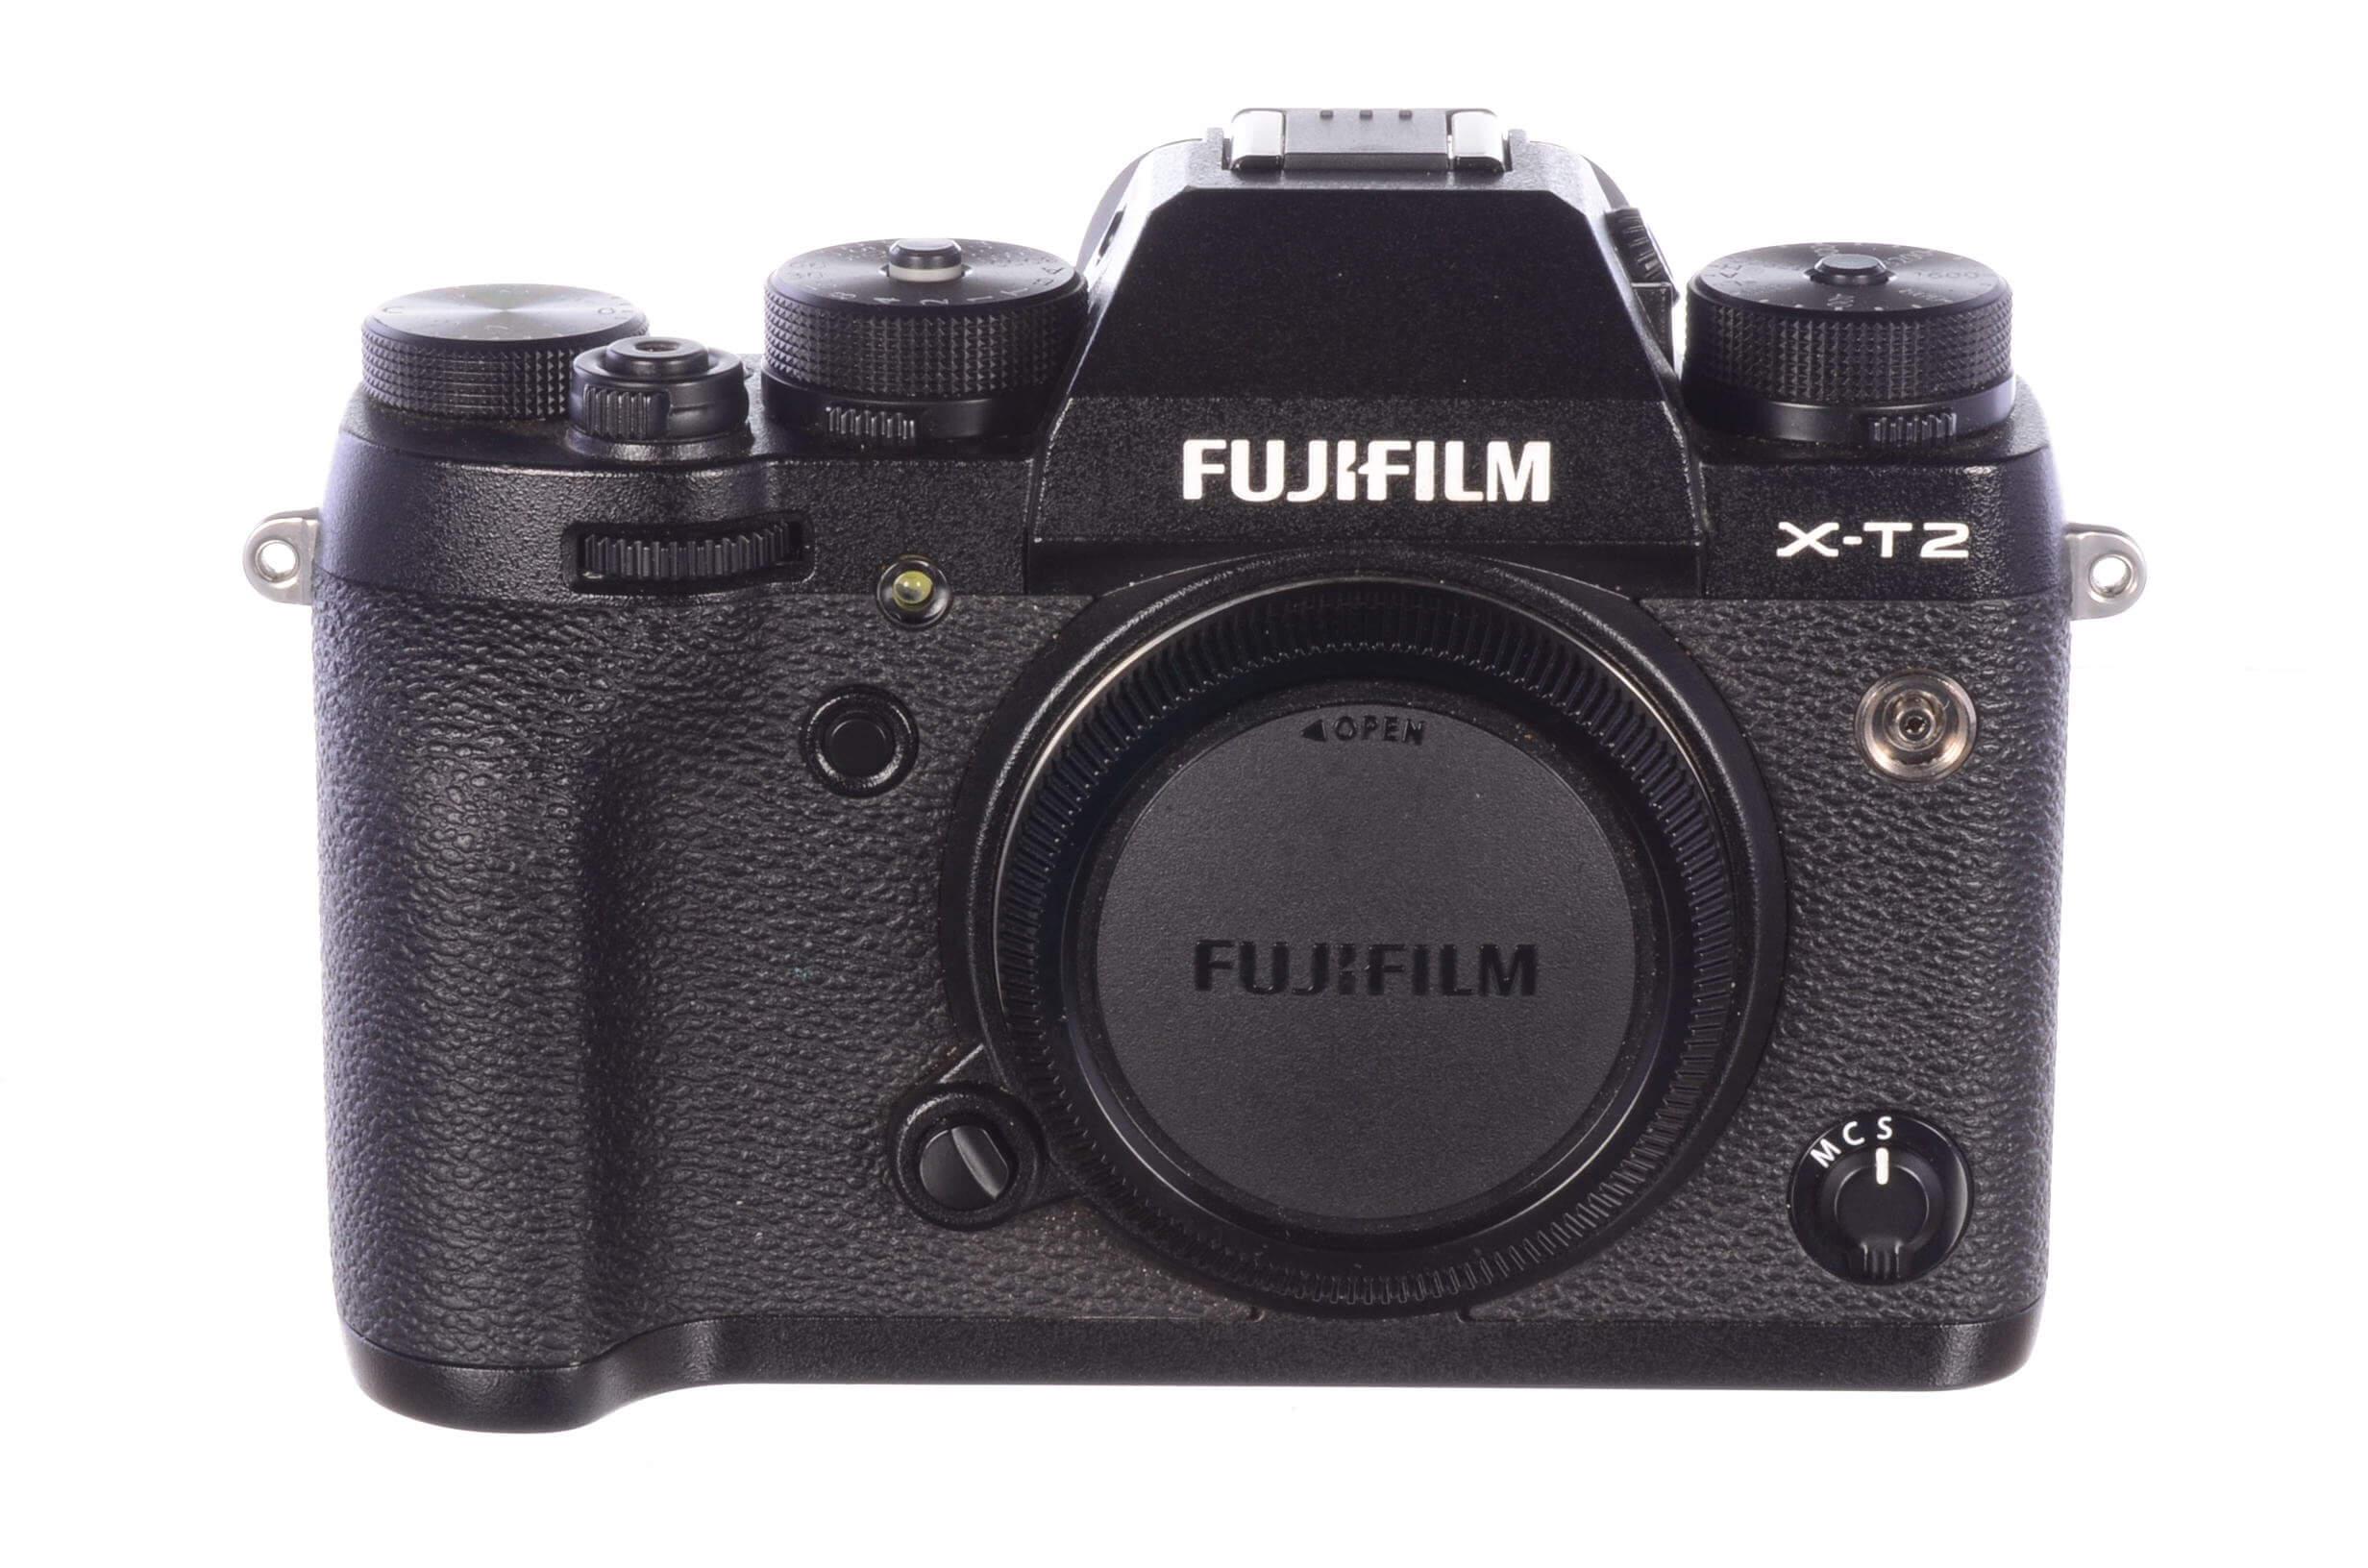 Fuji X-T2 body